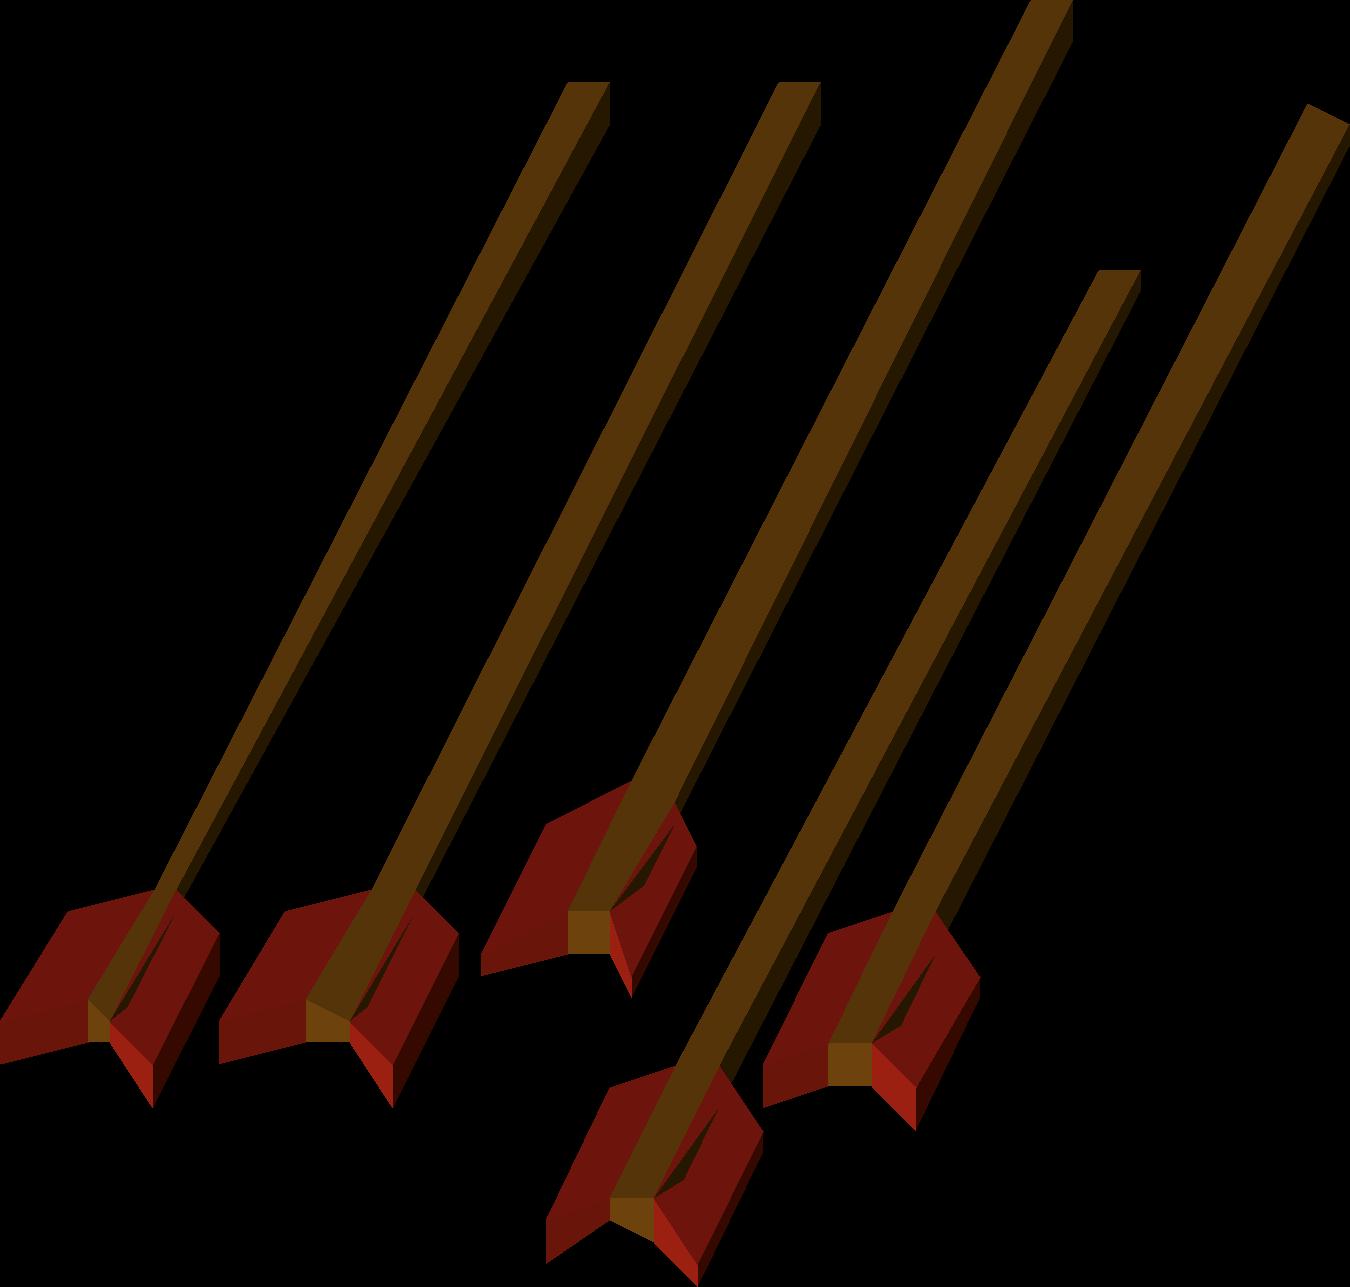 Headless Arrows